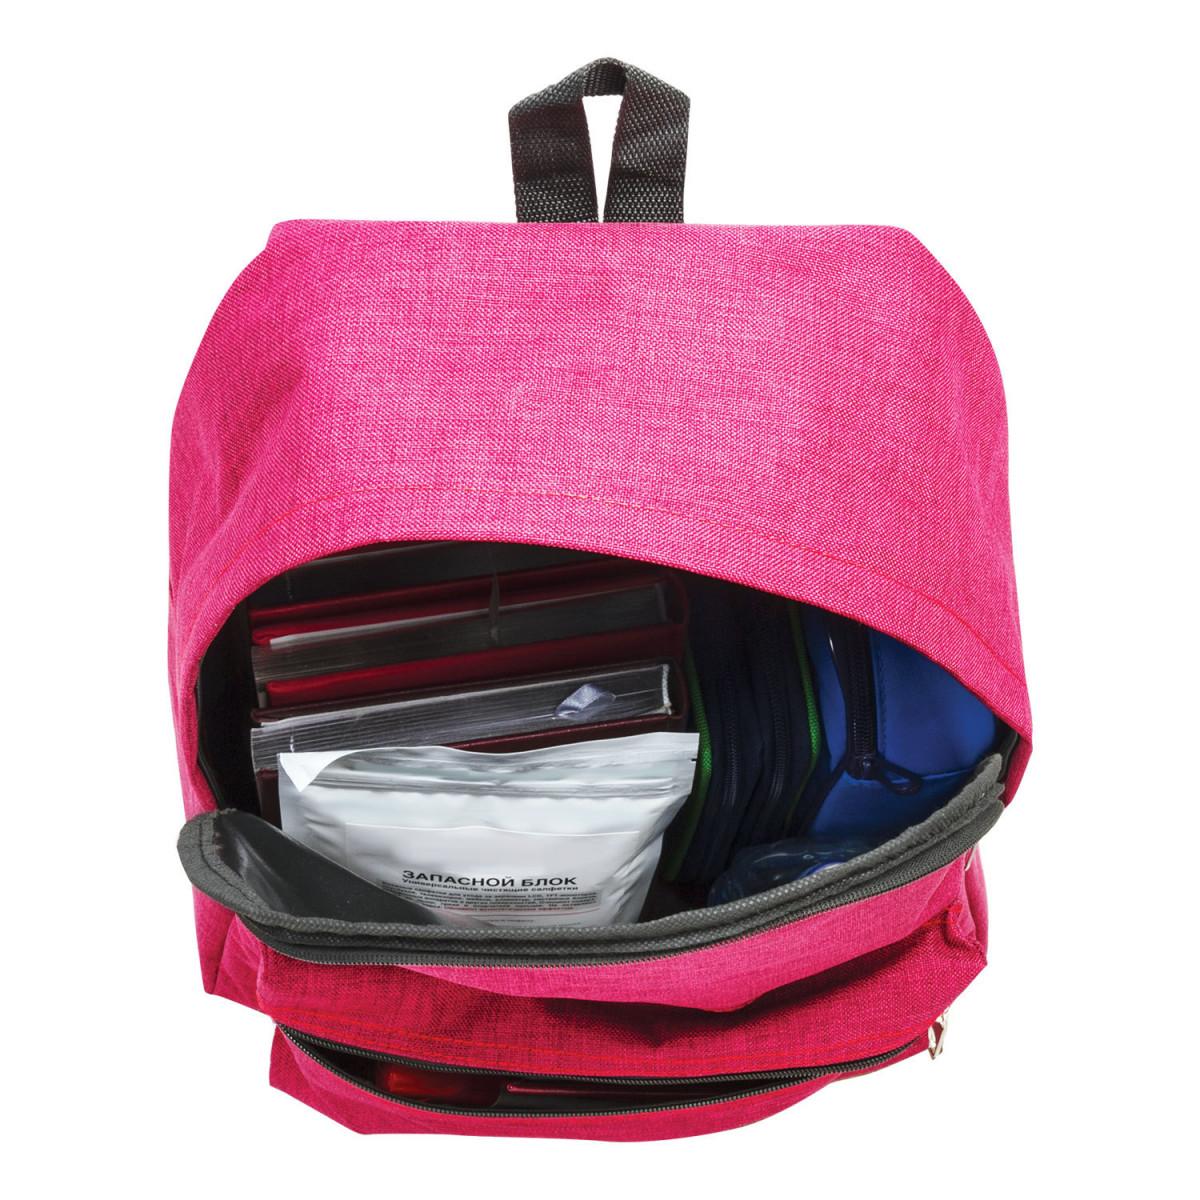 Рюкзак BRAUBERG молодежный, сити-формат, влагозащитный, бордовый, 40х30х13 см, 227103 (арт. 227103)